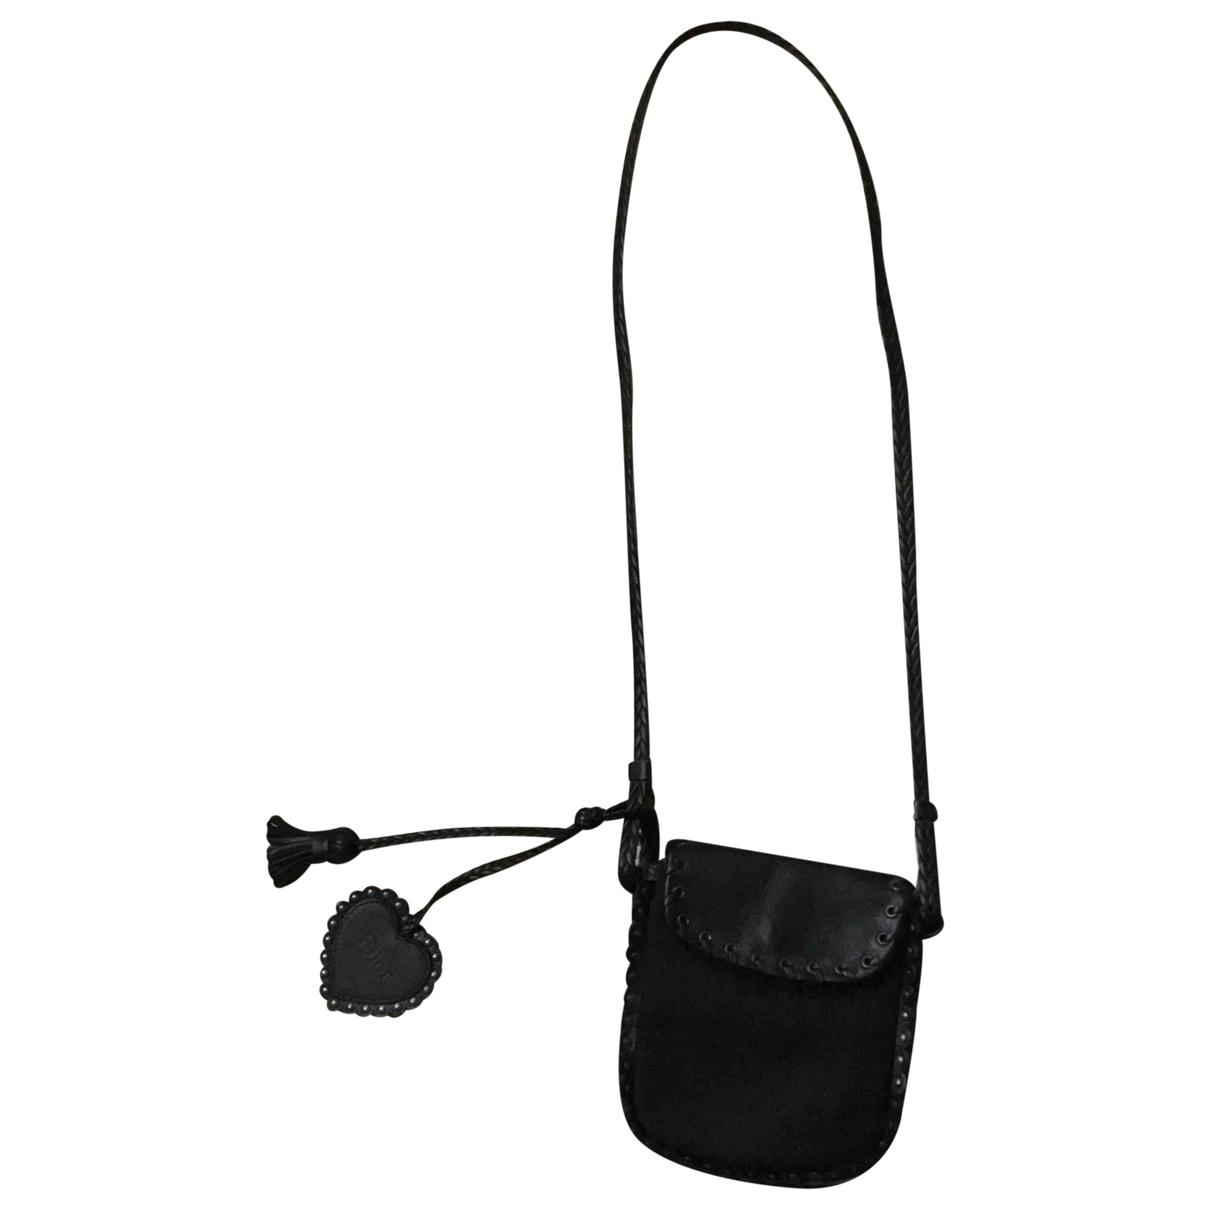 Dior \N Black Leather handbag for Women \N